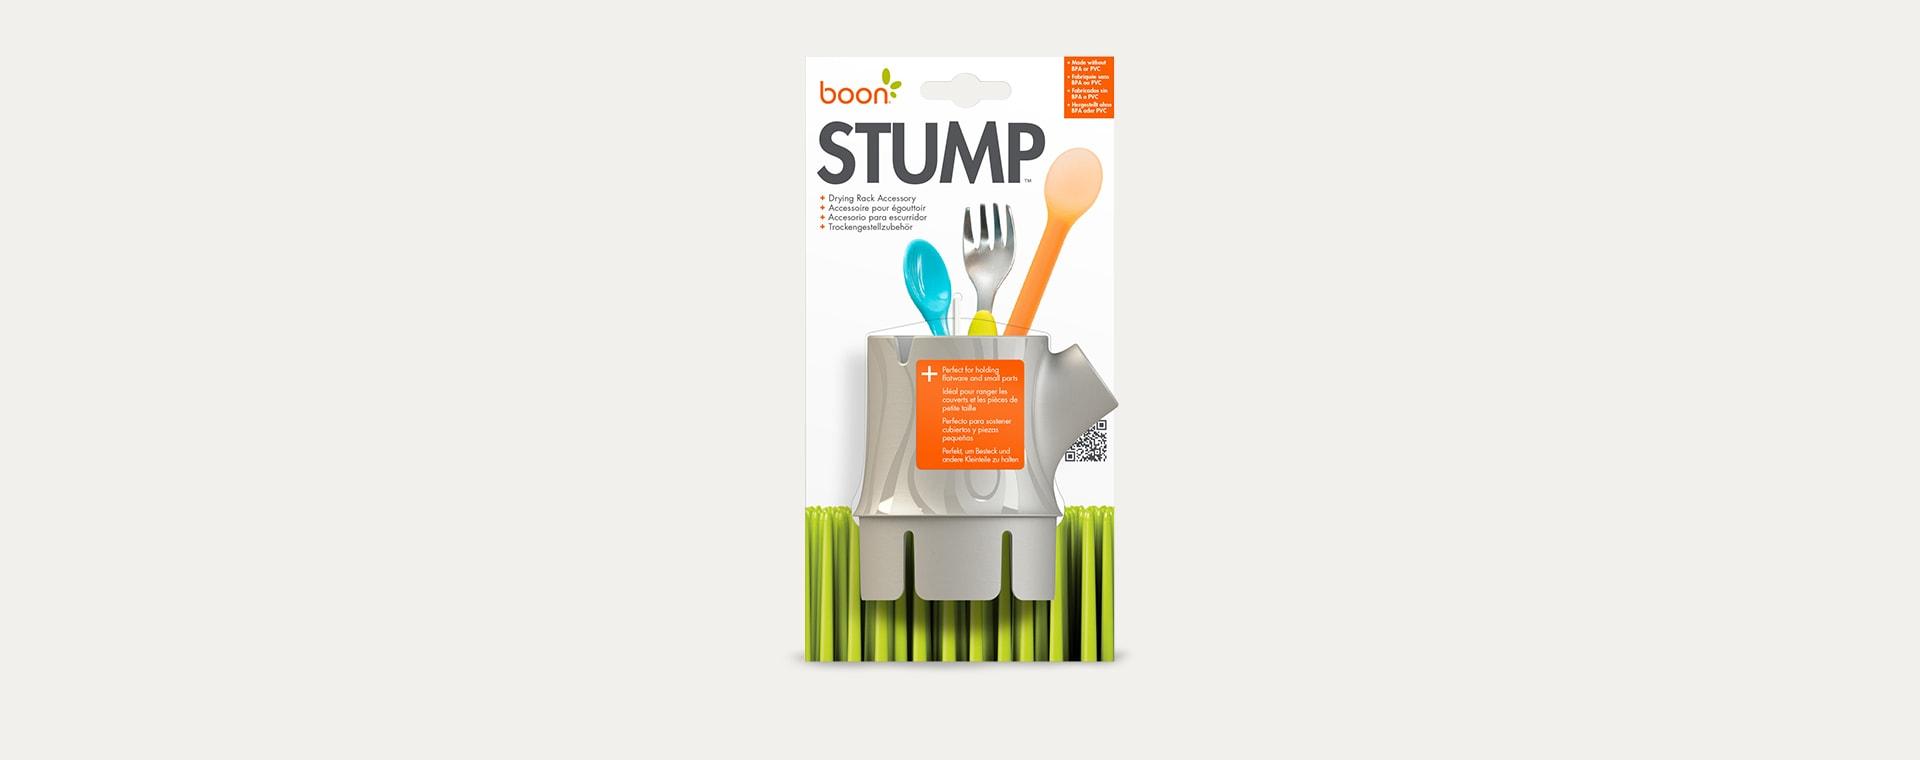 Grey Boon Stump